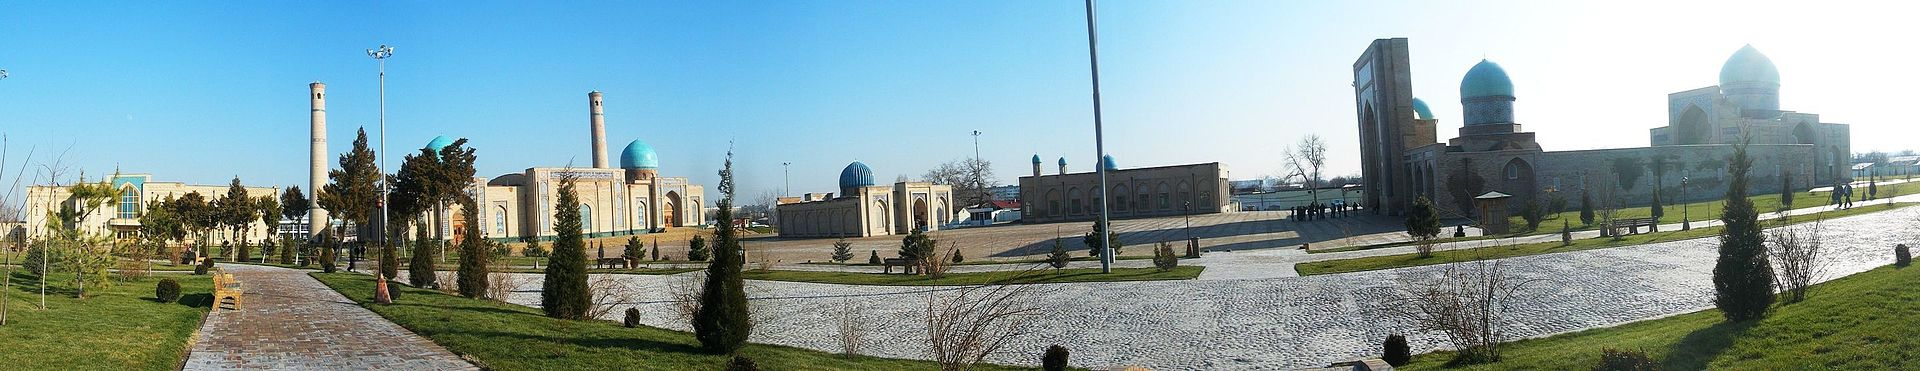 1920px-Khazrat_Imam_panorama.jpg